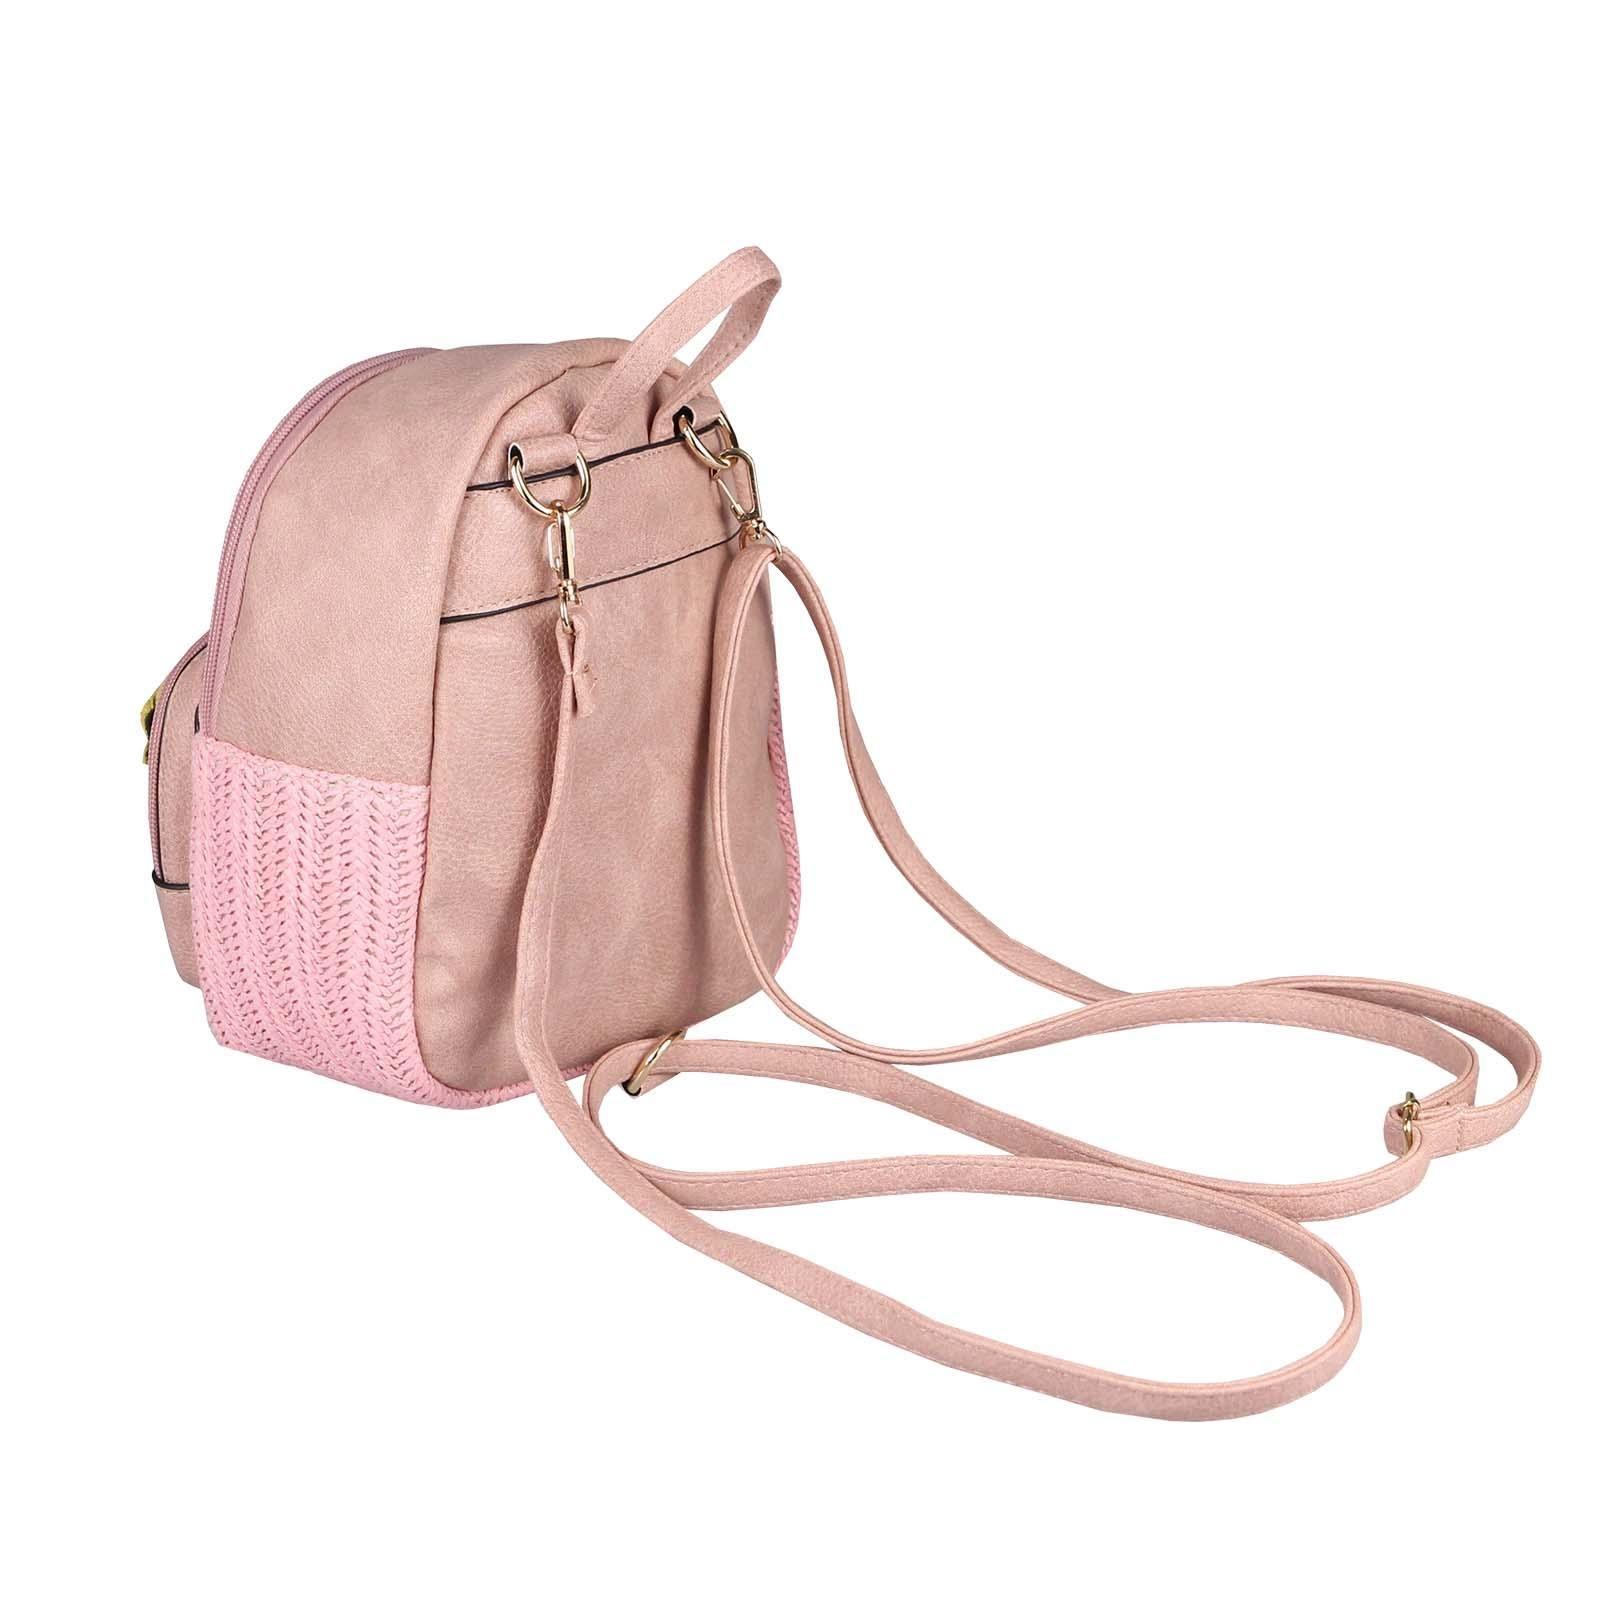 5f6f034c3e00e ital-design DAMEN BLUMEN MINI-RUCKSACK Backpack Tasche Daypack Cityrucksack  Leder Optik Schultertasche Flechtoptik